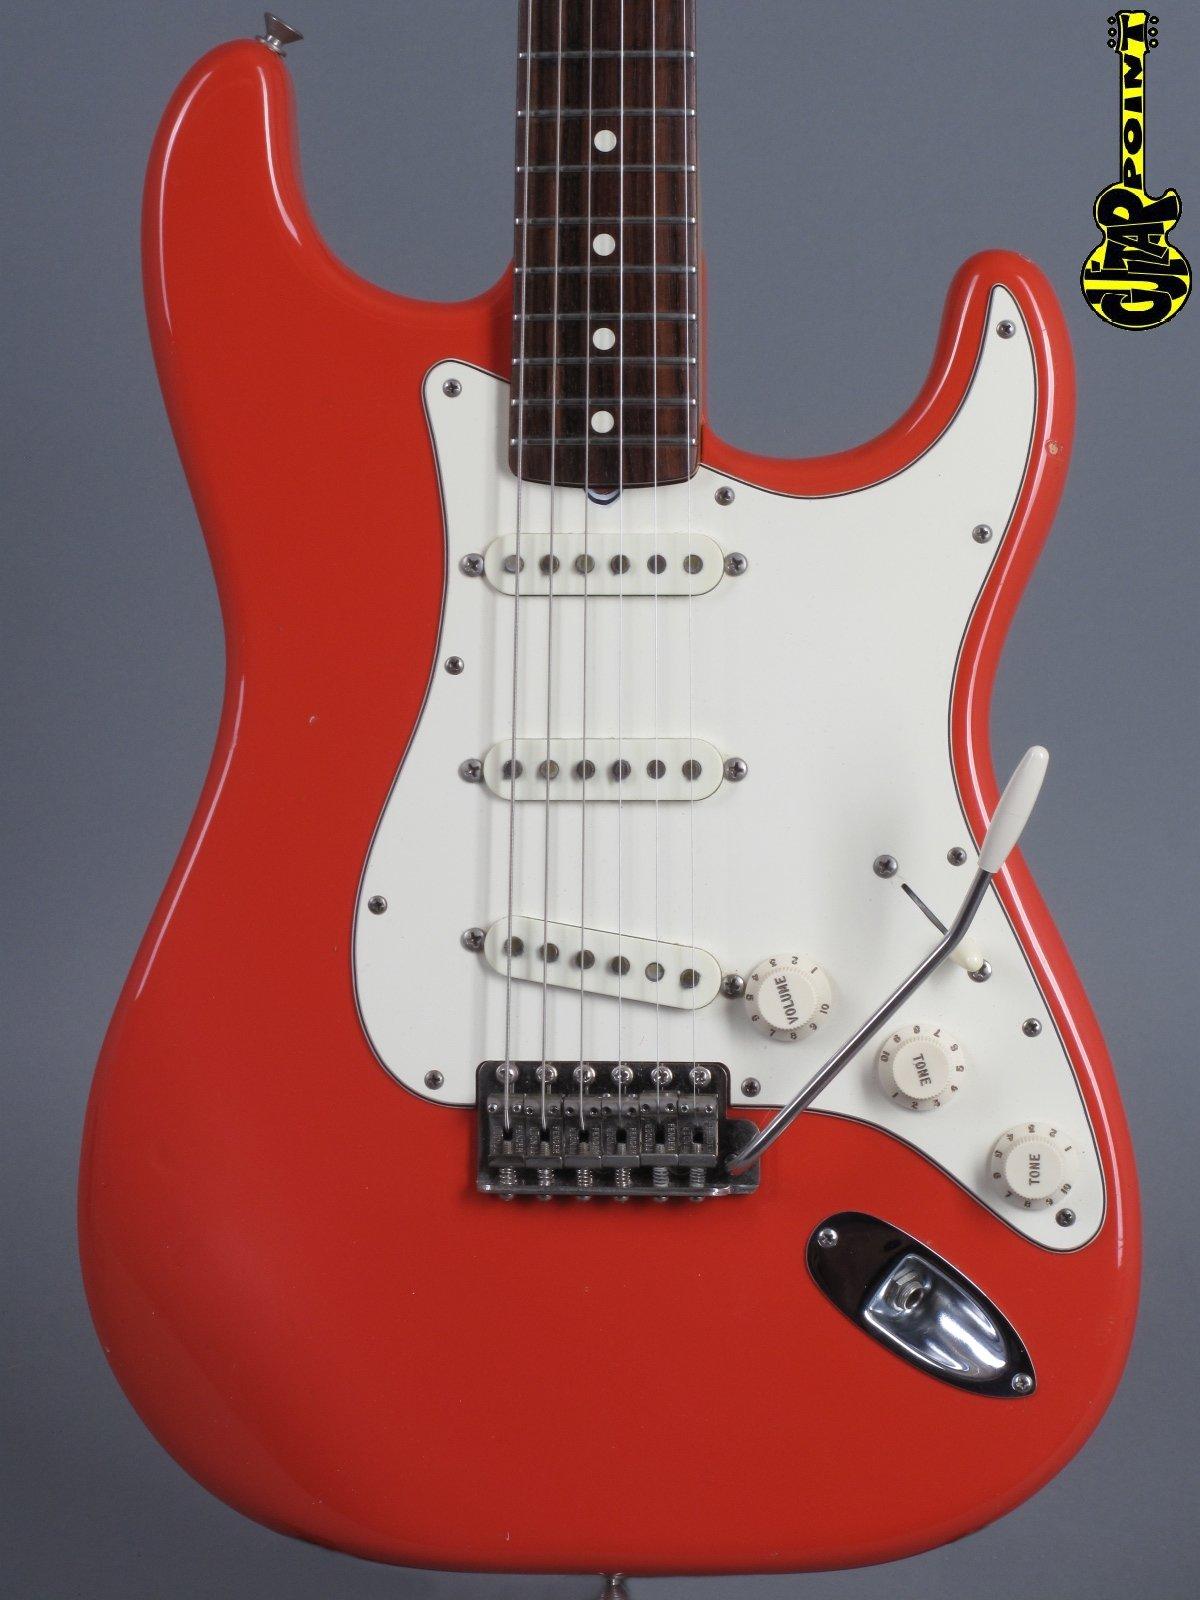 "1982 Fender American Vintage '62 ""Fullerton"" Reissue Stratocaster - Fiesta Red"